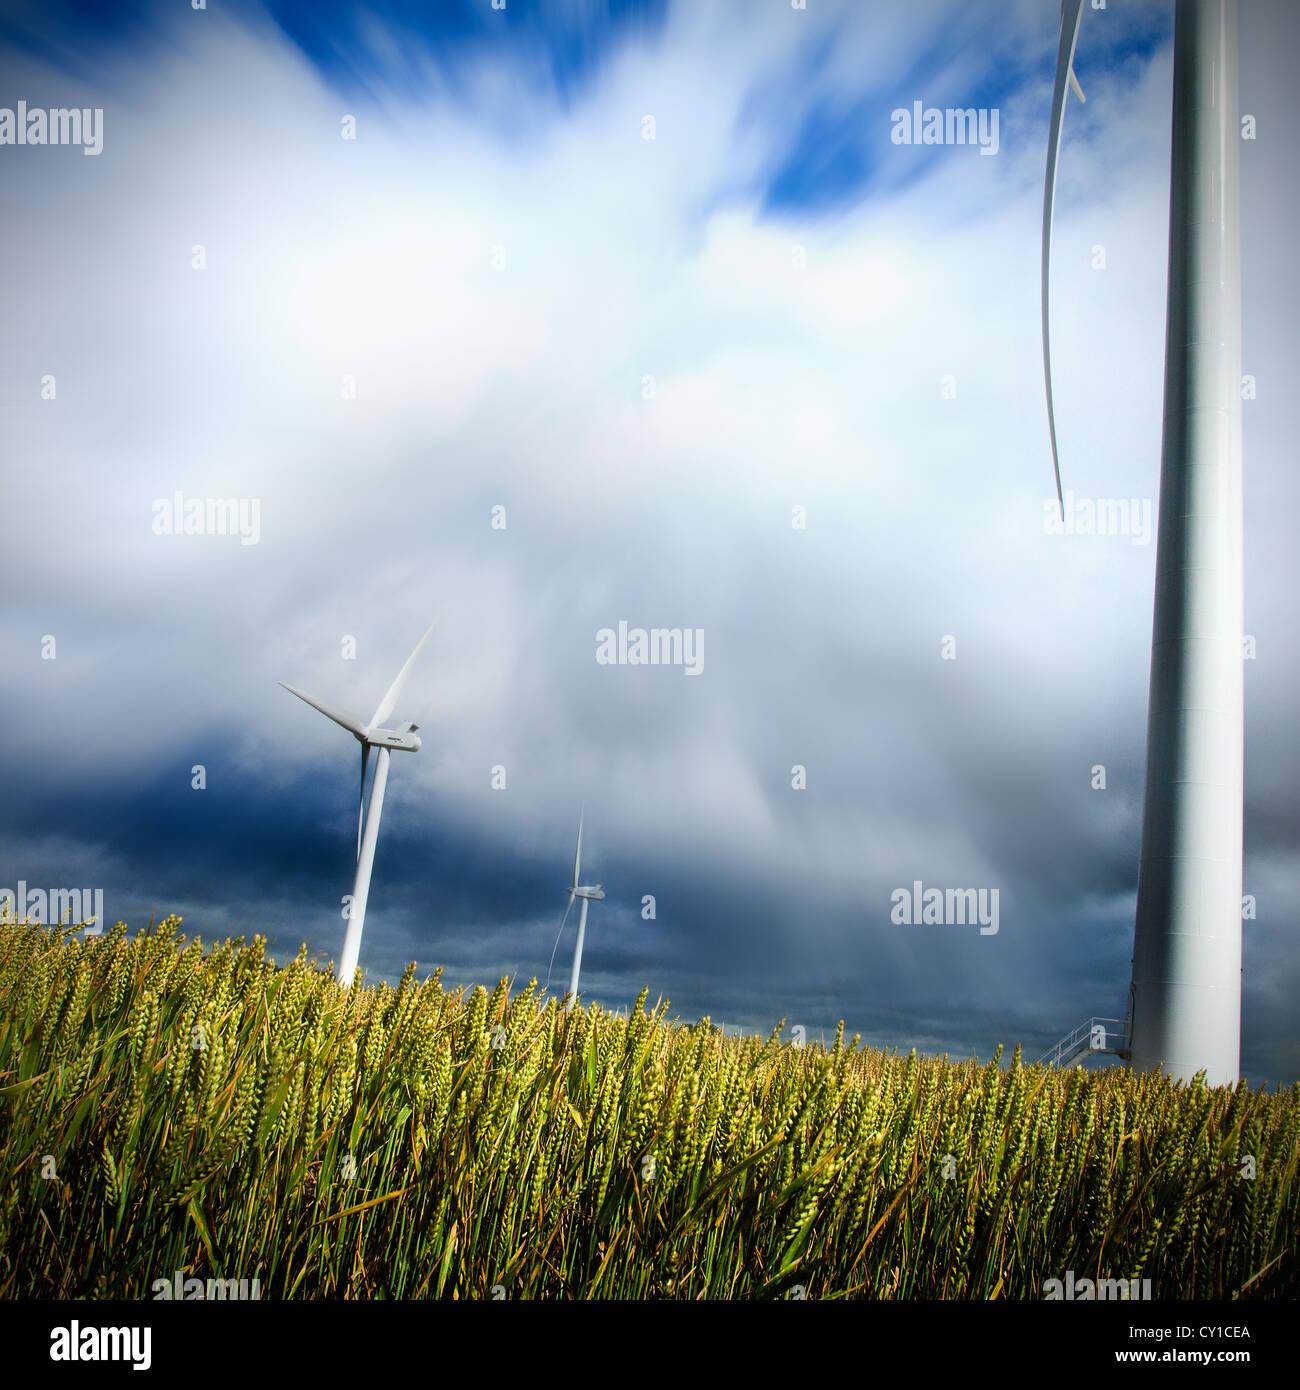 Wind Farm in Market Weighton England Renewable energy - Stock Image